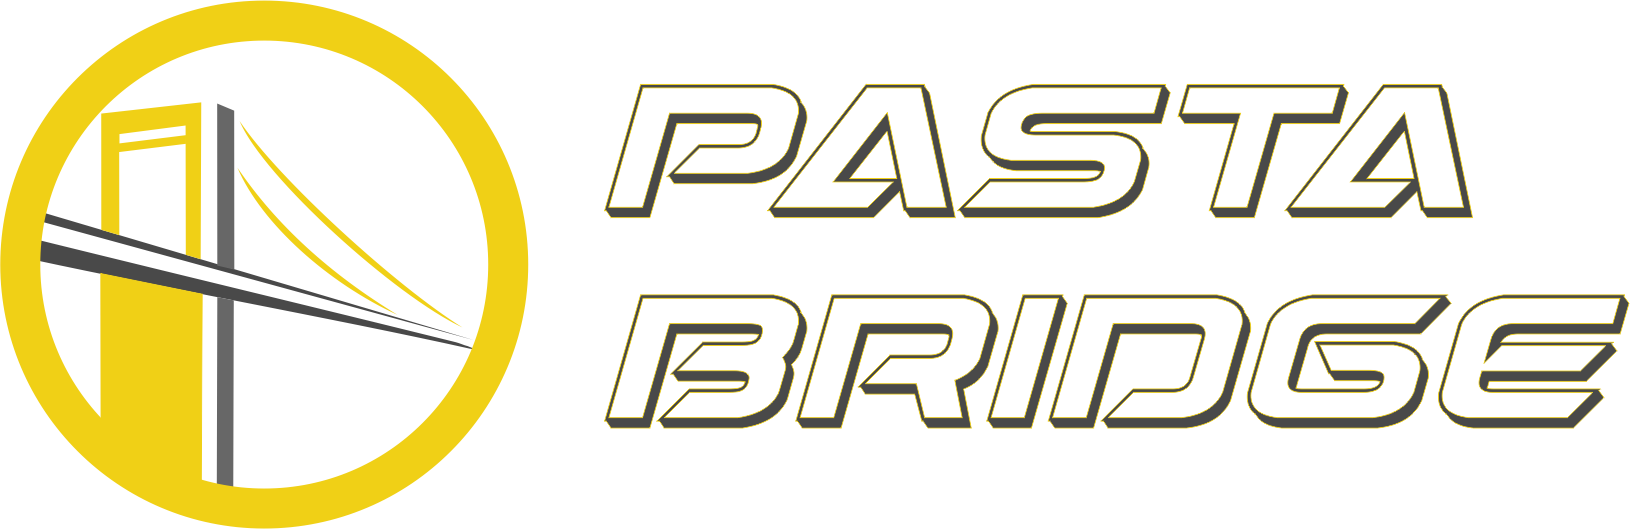 Pasta Bridge - sigla cu PB